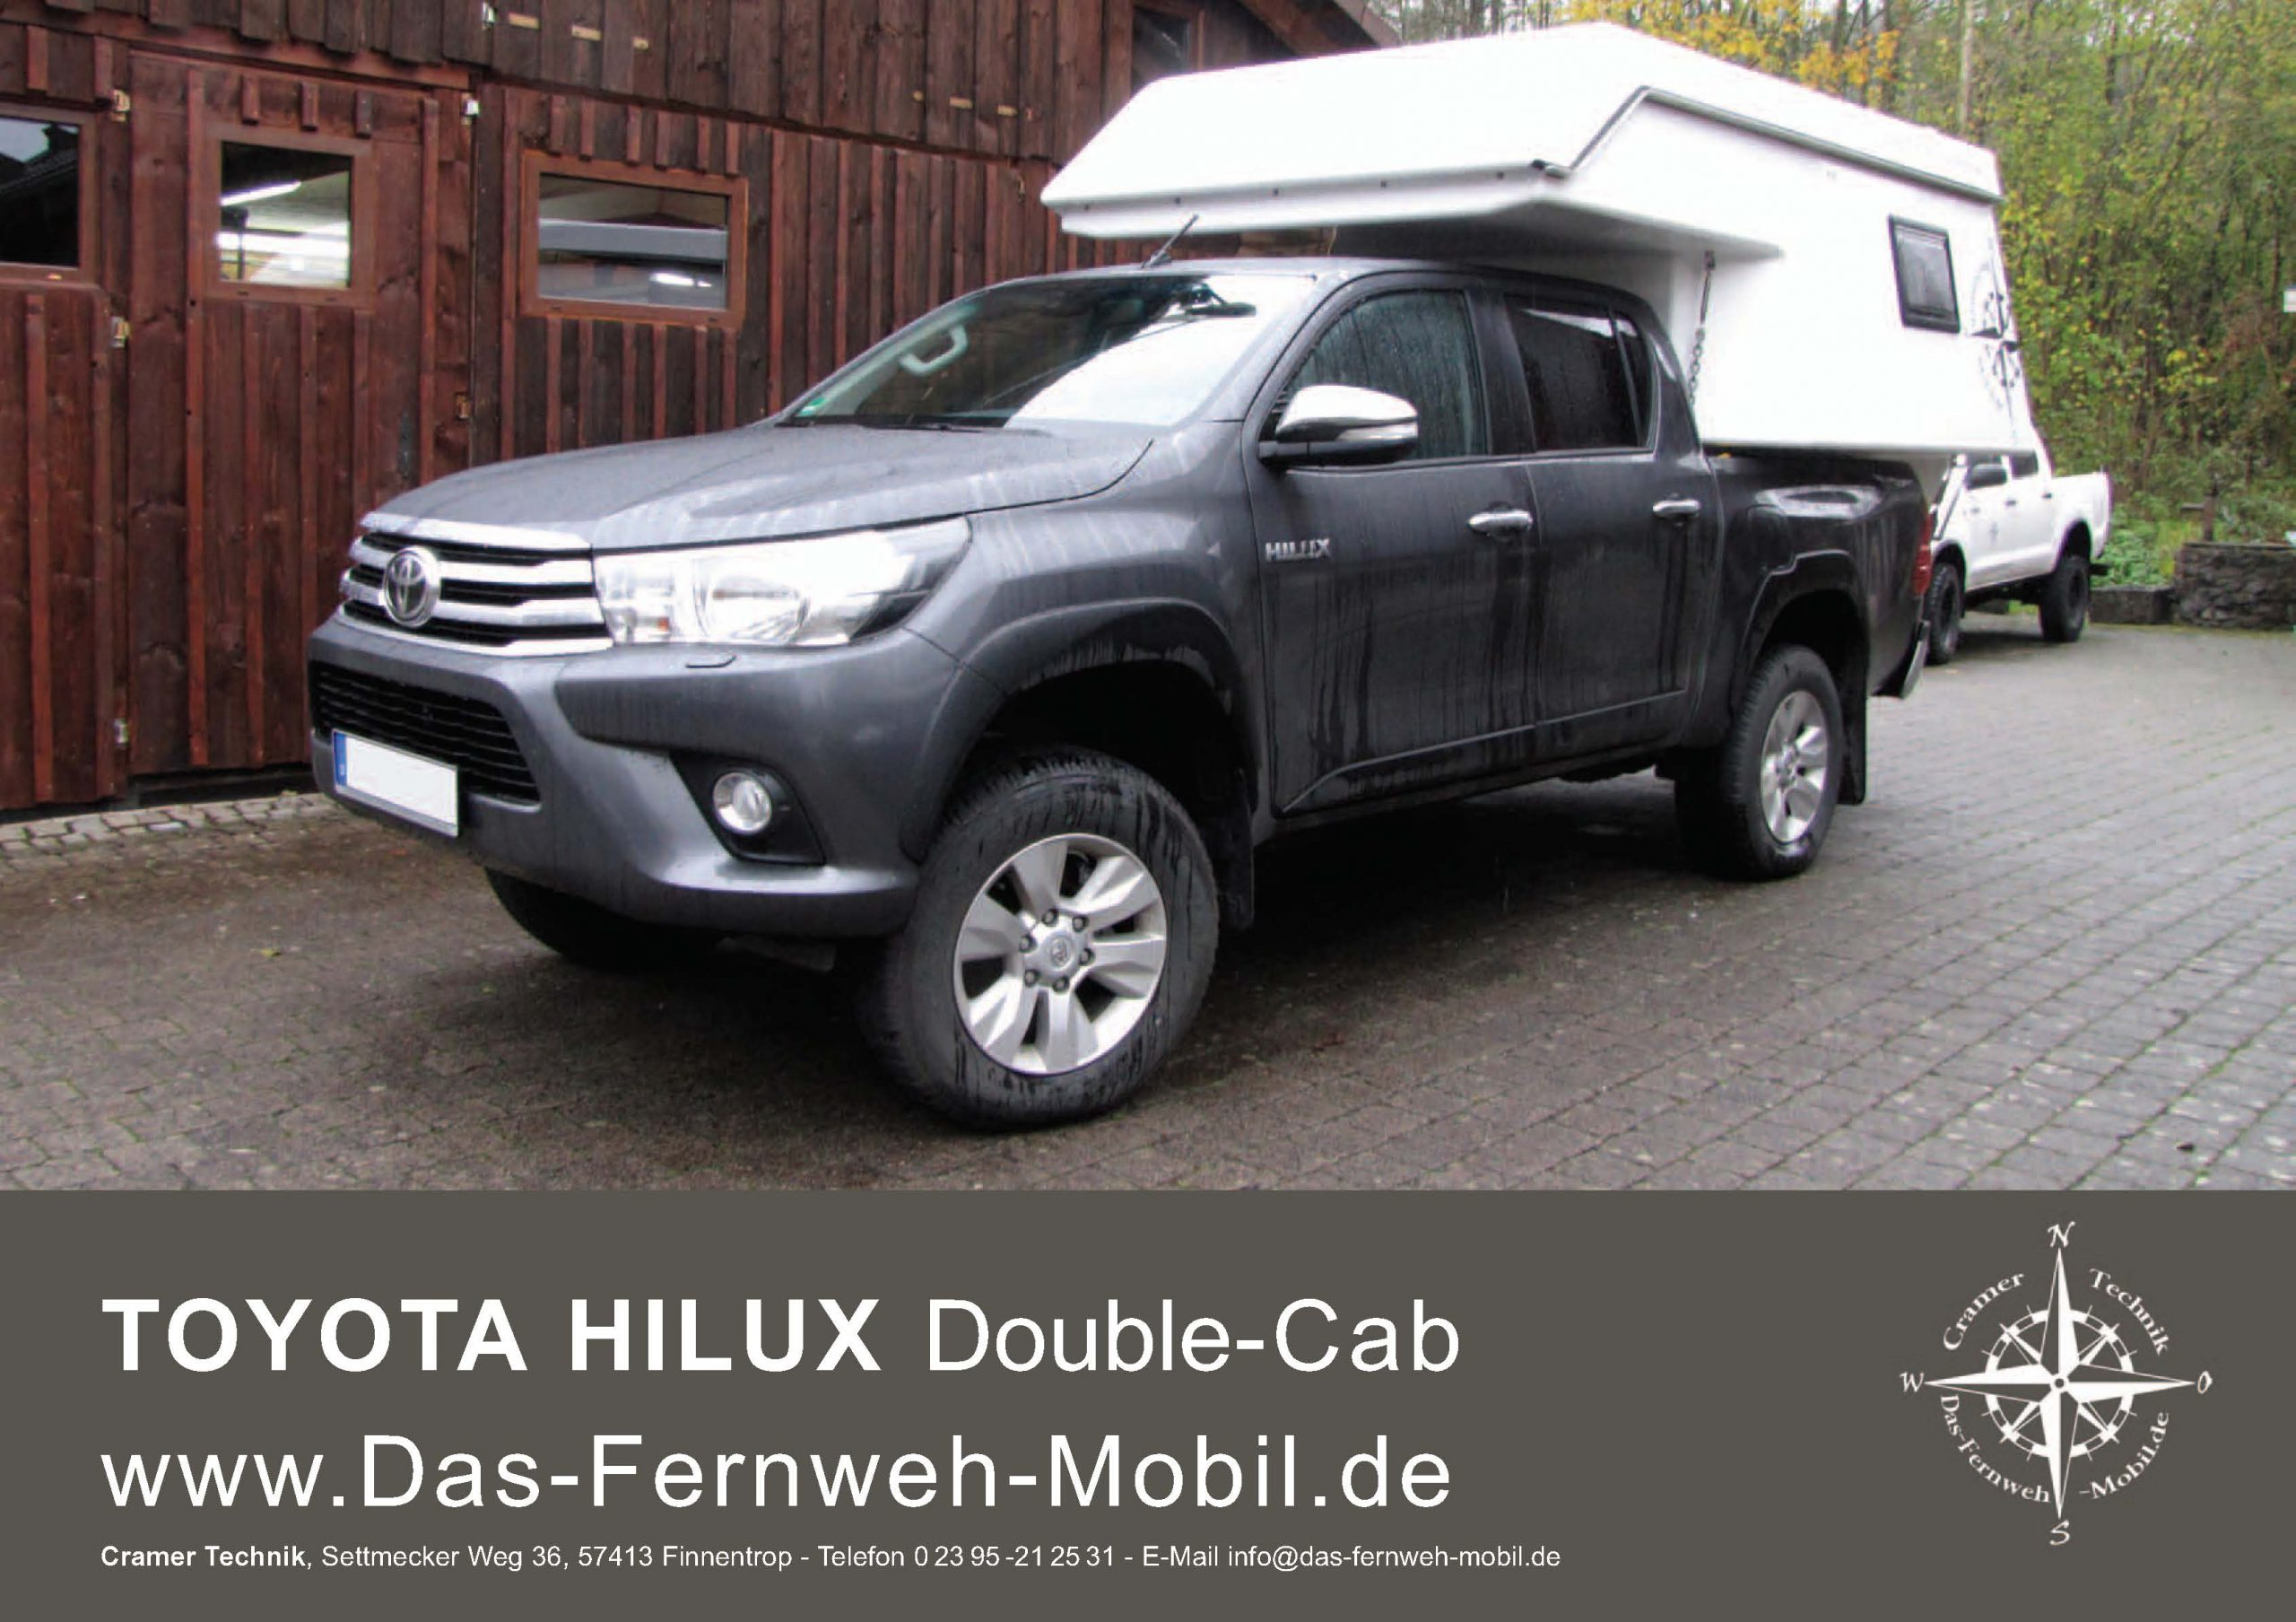 datenblatt-toyota-hilux-double-cab-102019-k_Seite_1